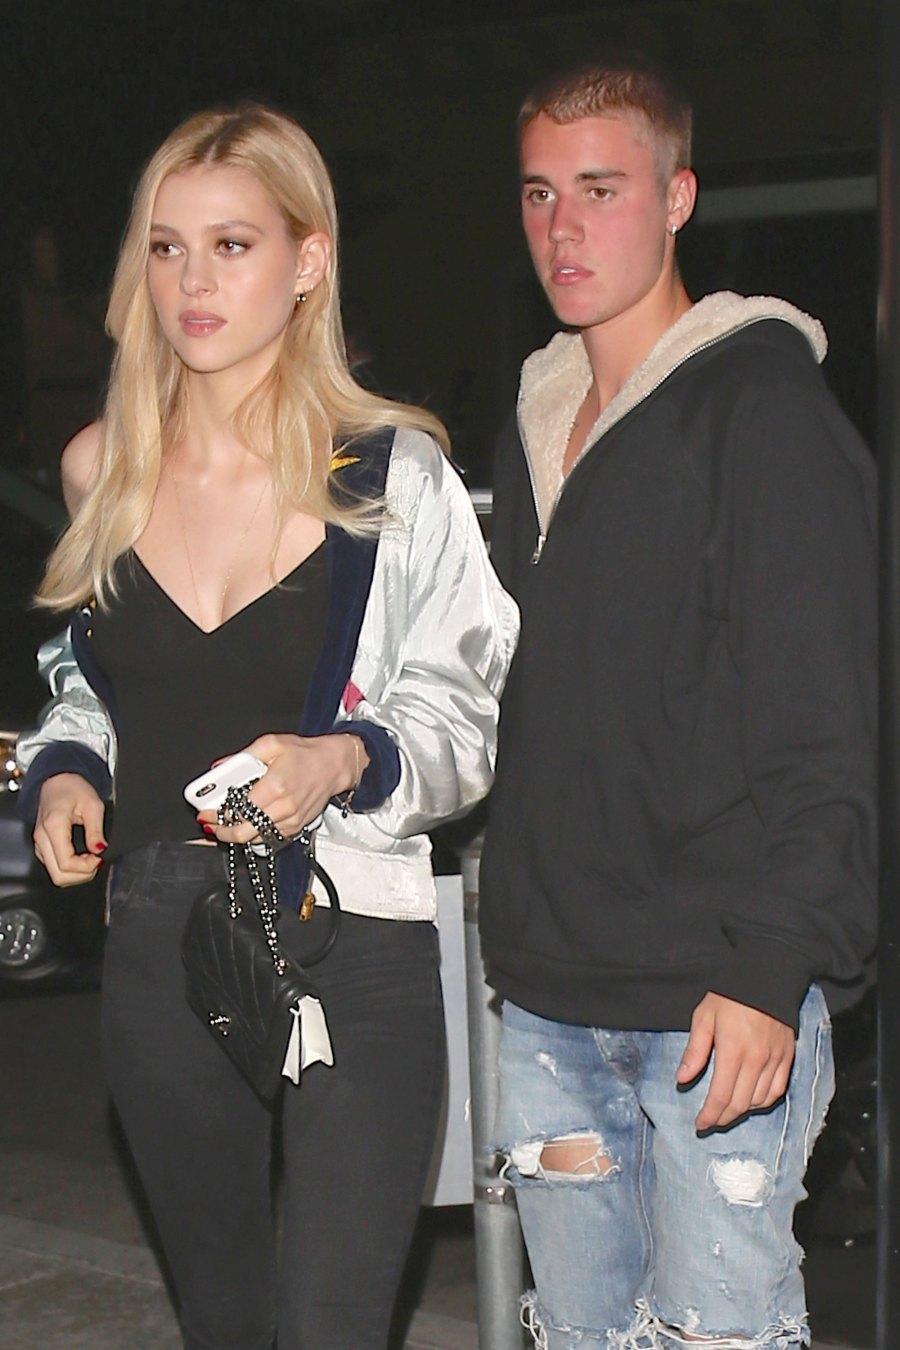 Nicola peltz dating rich people dating